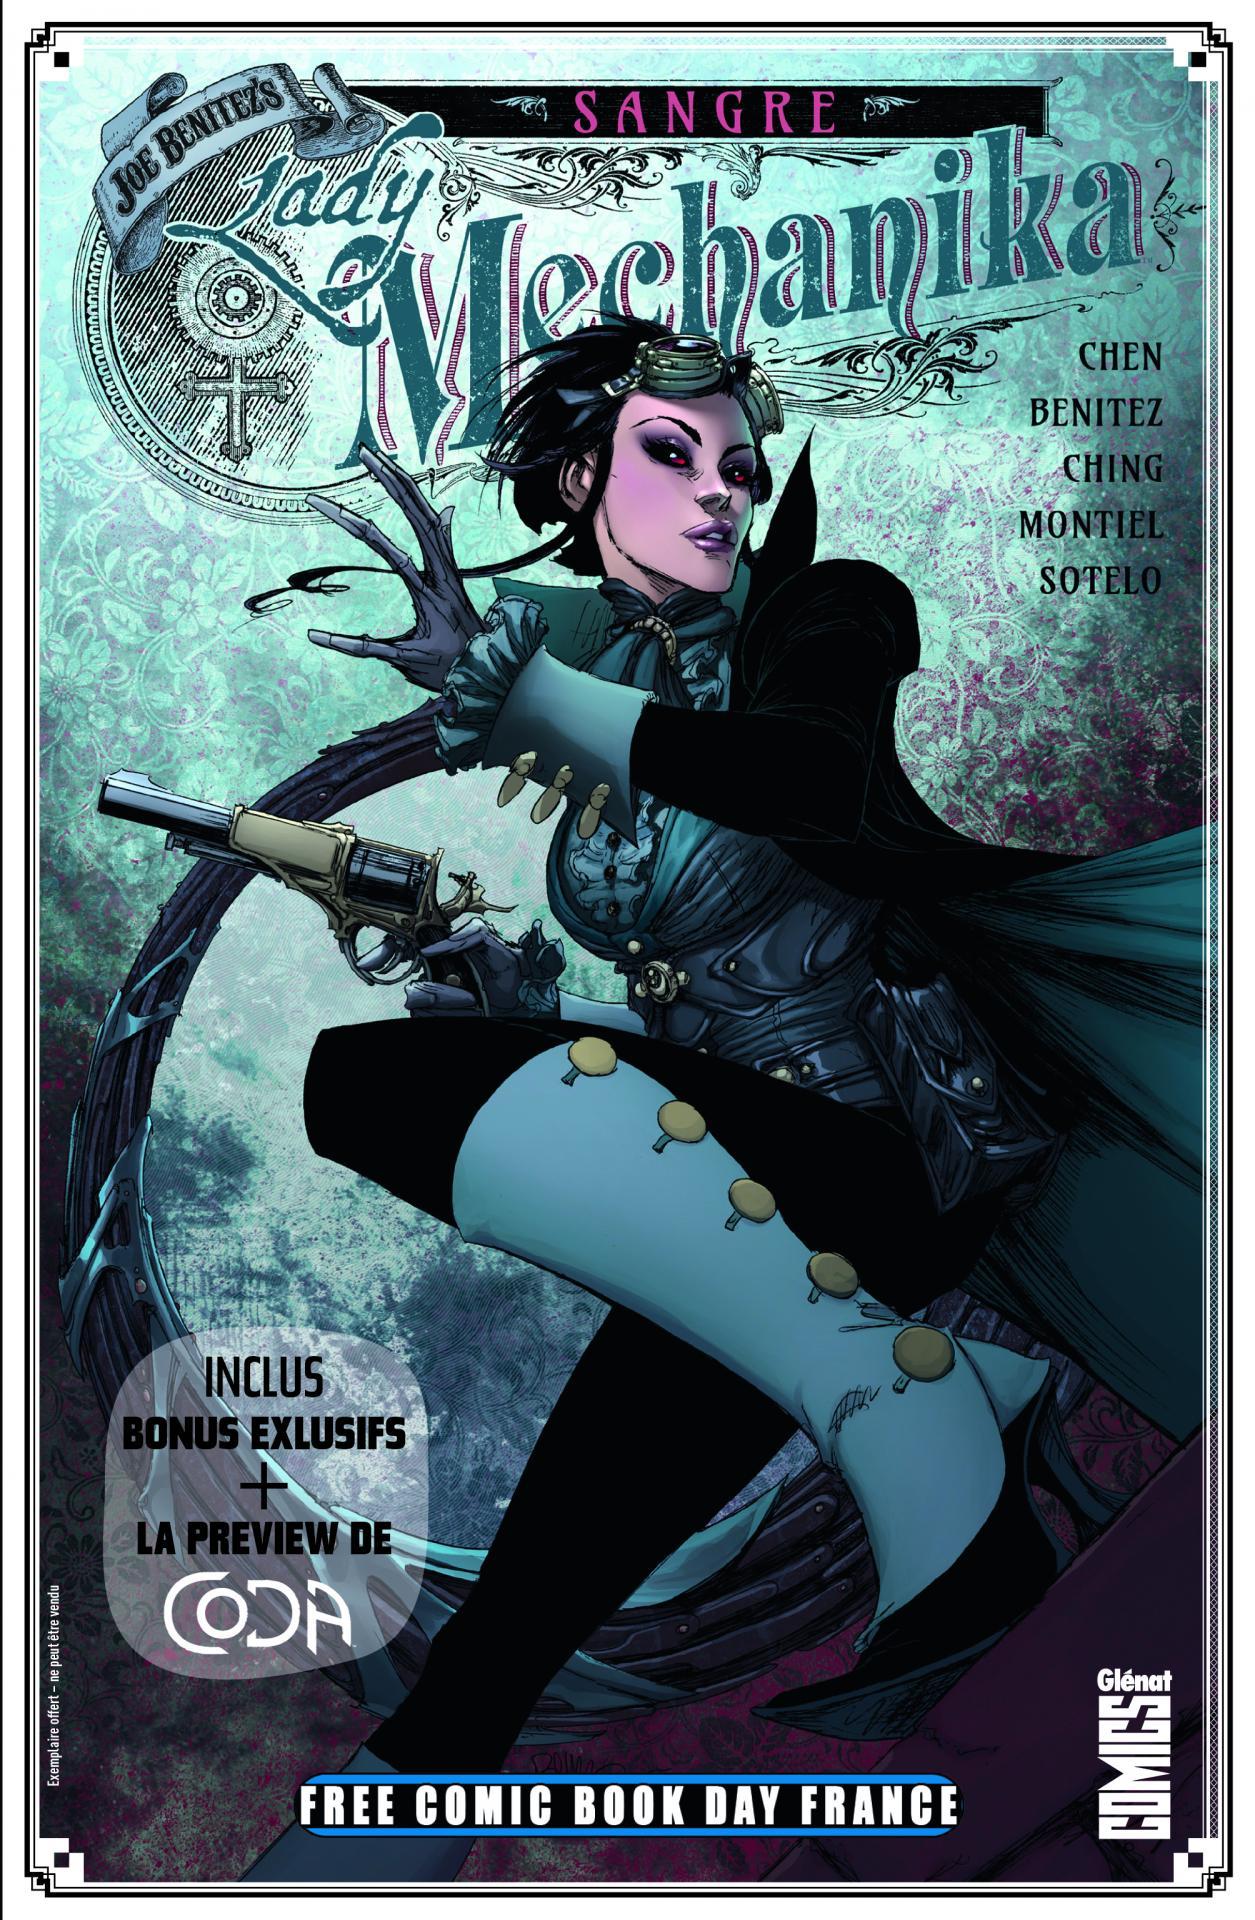 Glenat comics free comic book day france 2020 lady mechanic sangre